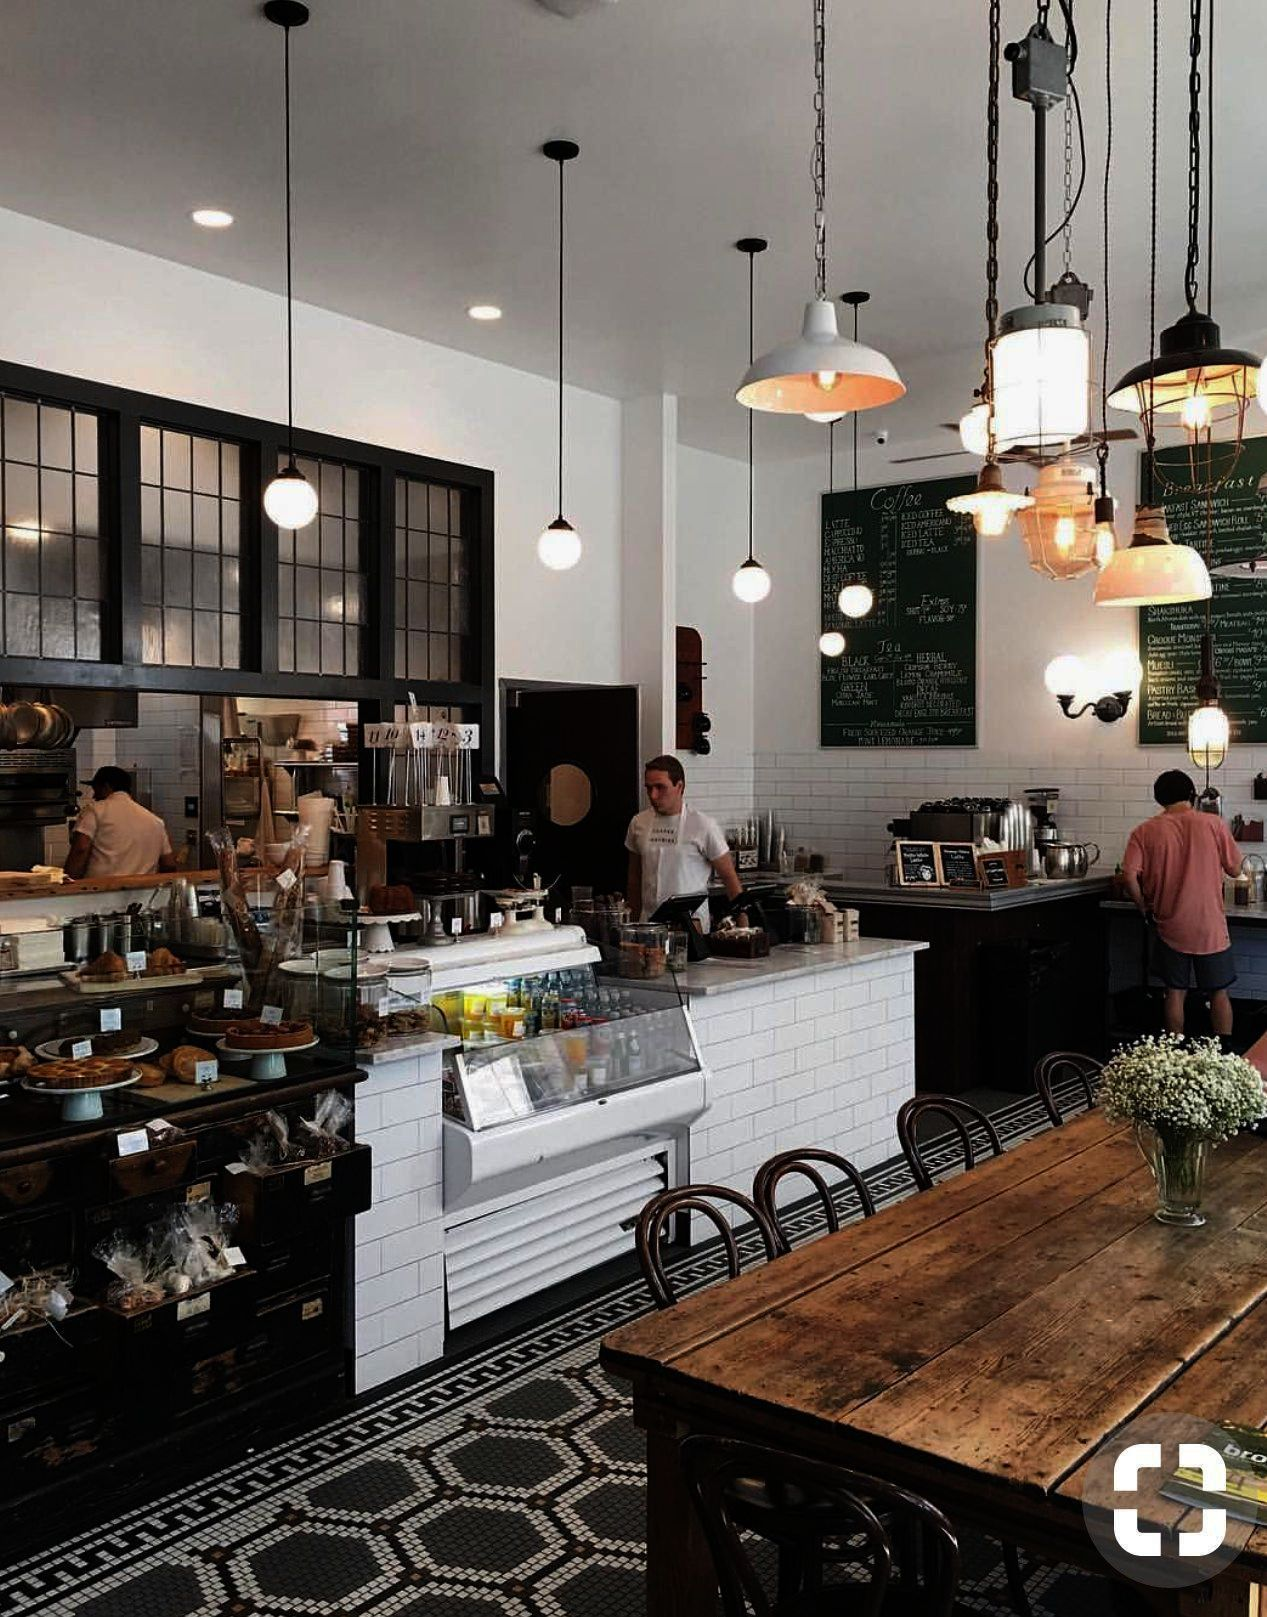 Coffee Maker Lifespan To Coffee Shop Near Me Open Late Coffee Shop Decor Restaurant Interior Design Cafe Interior Design